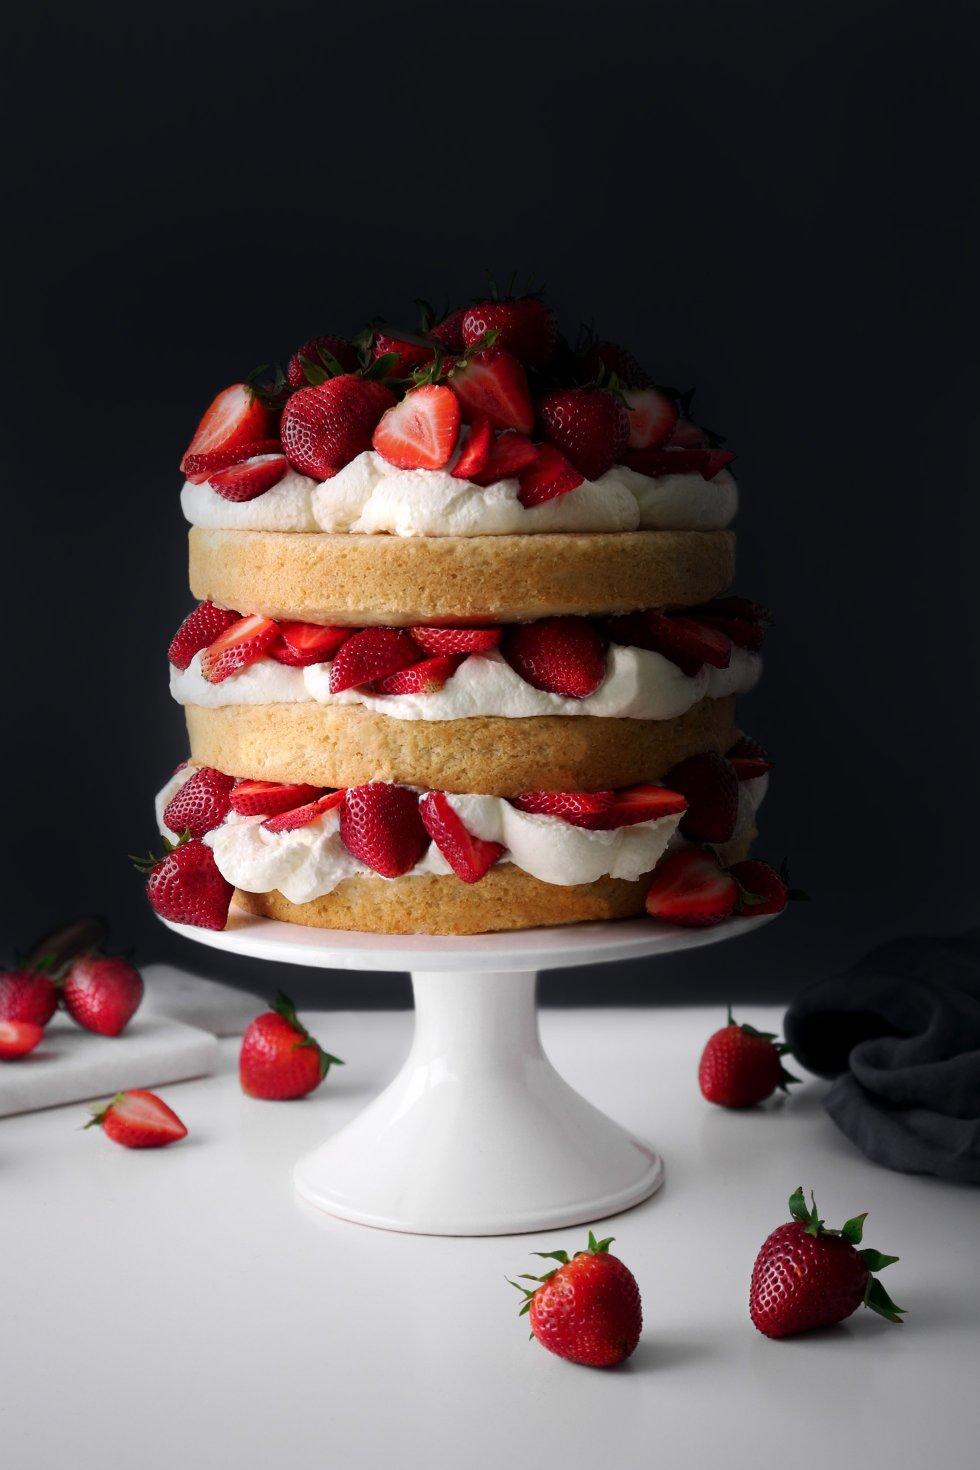 Strawberry Shortcake Cake | Vegan Friendly with a Gluten-Free Option